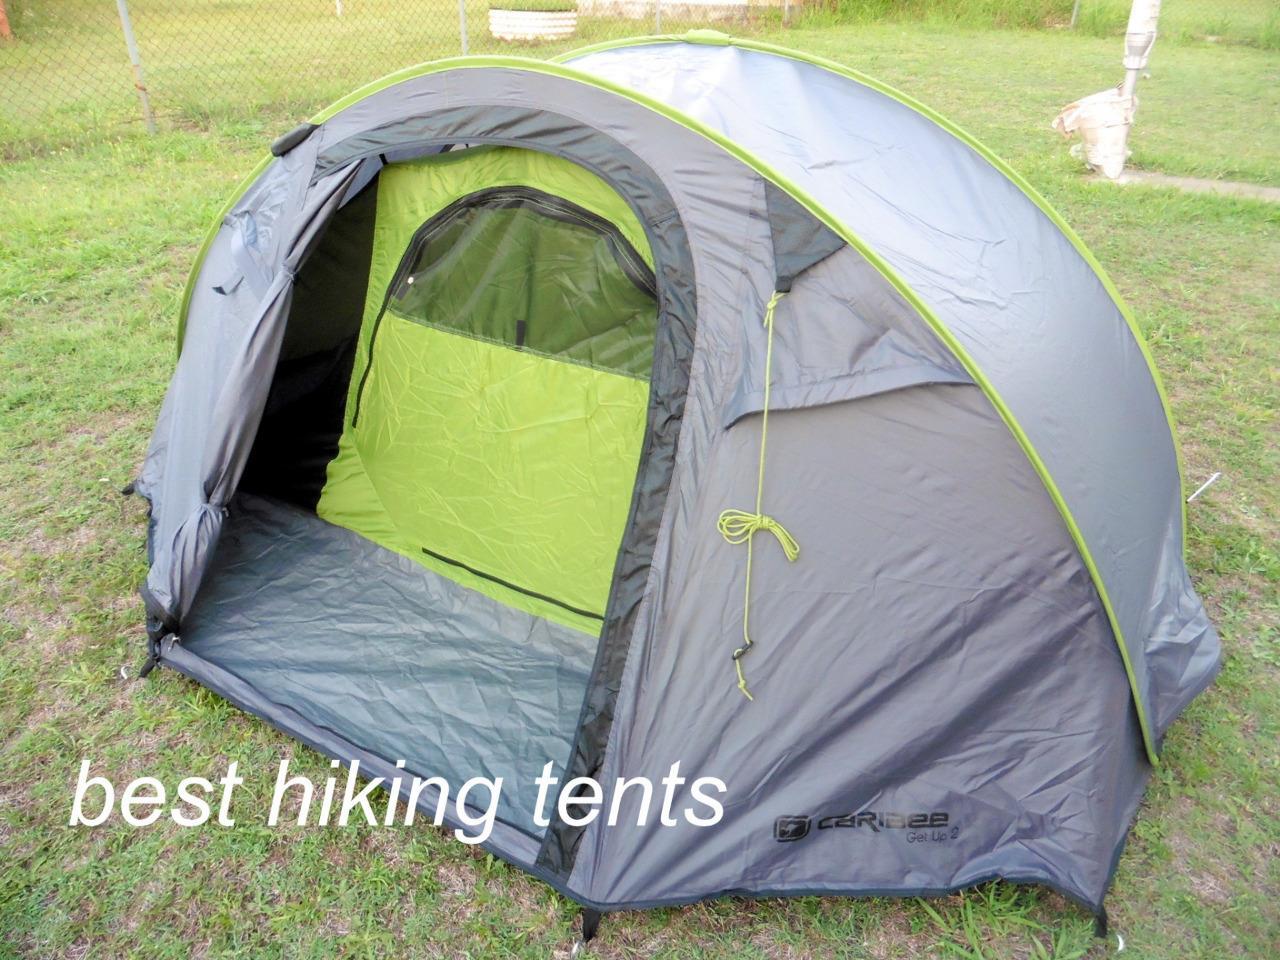 Caribee Get Up Tent Auto Pop Up Speedy Instant Open C&ing Hiking 2-3 Mens Size & Caribee Get Up Tent Auto Pop Up Speedy Instant Open Camping Hiking ...